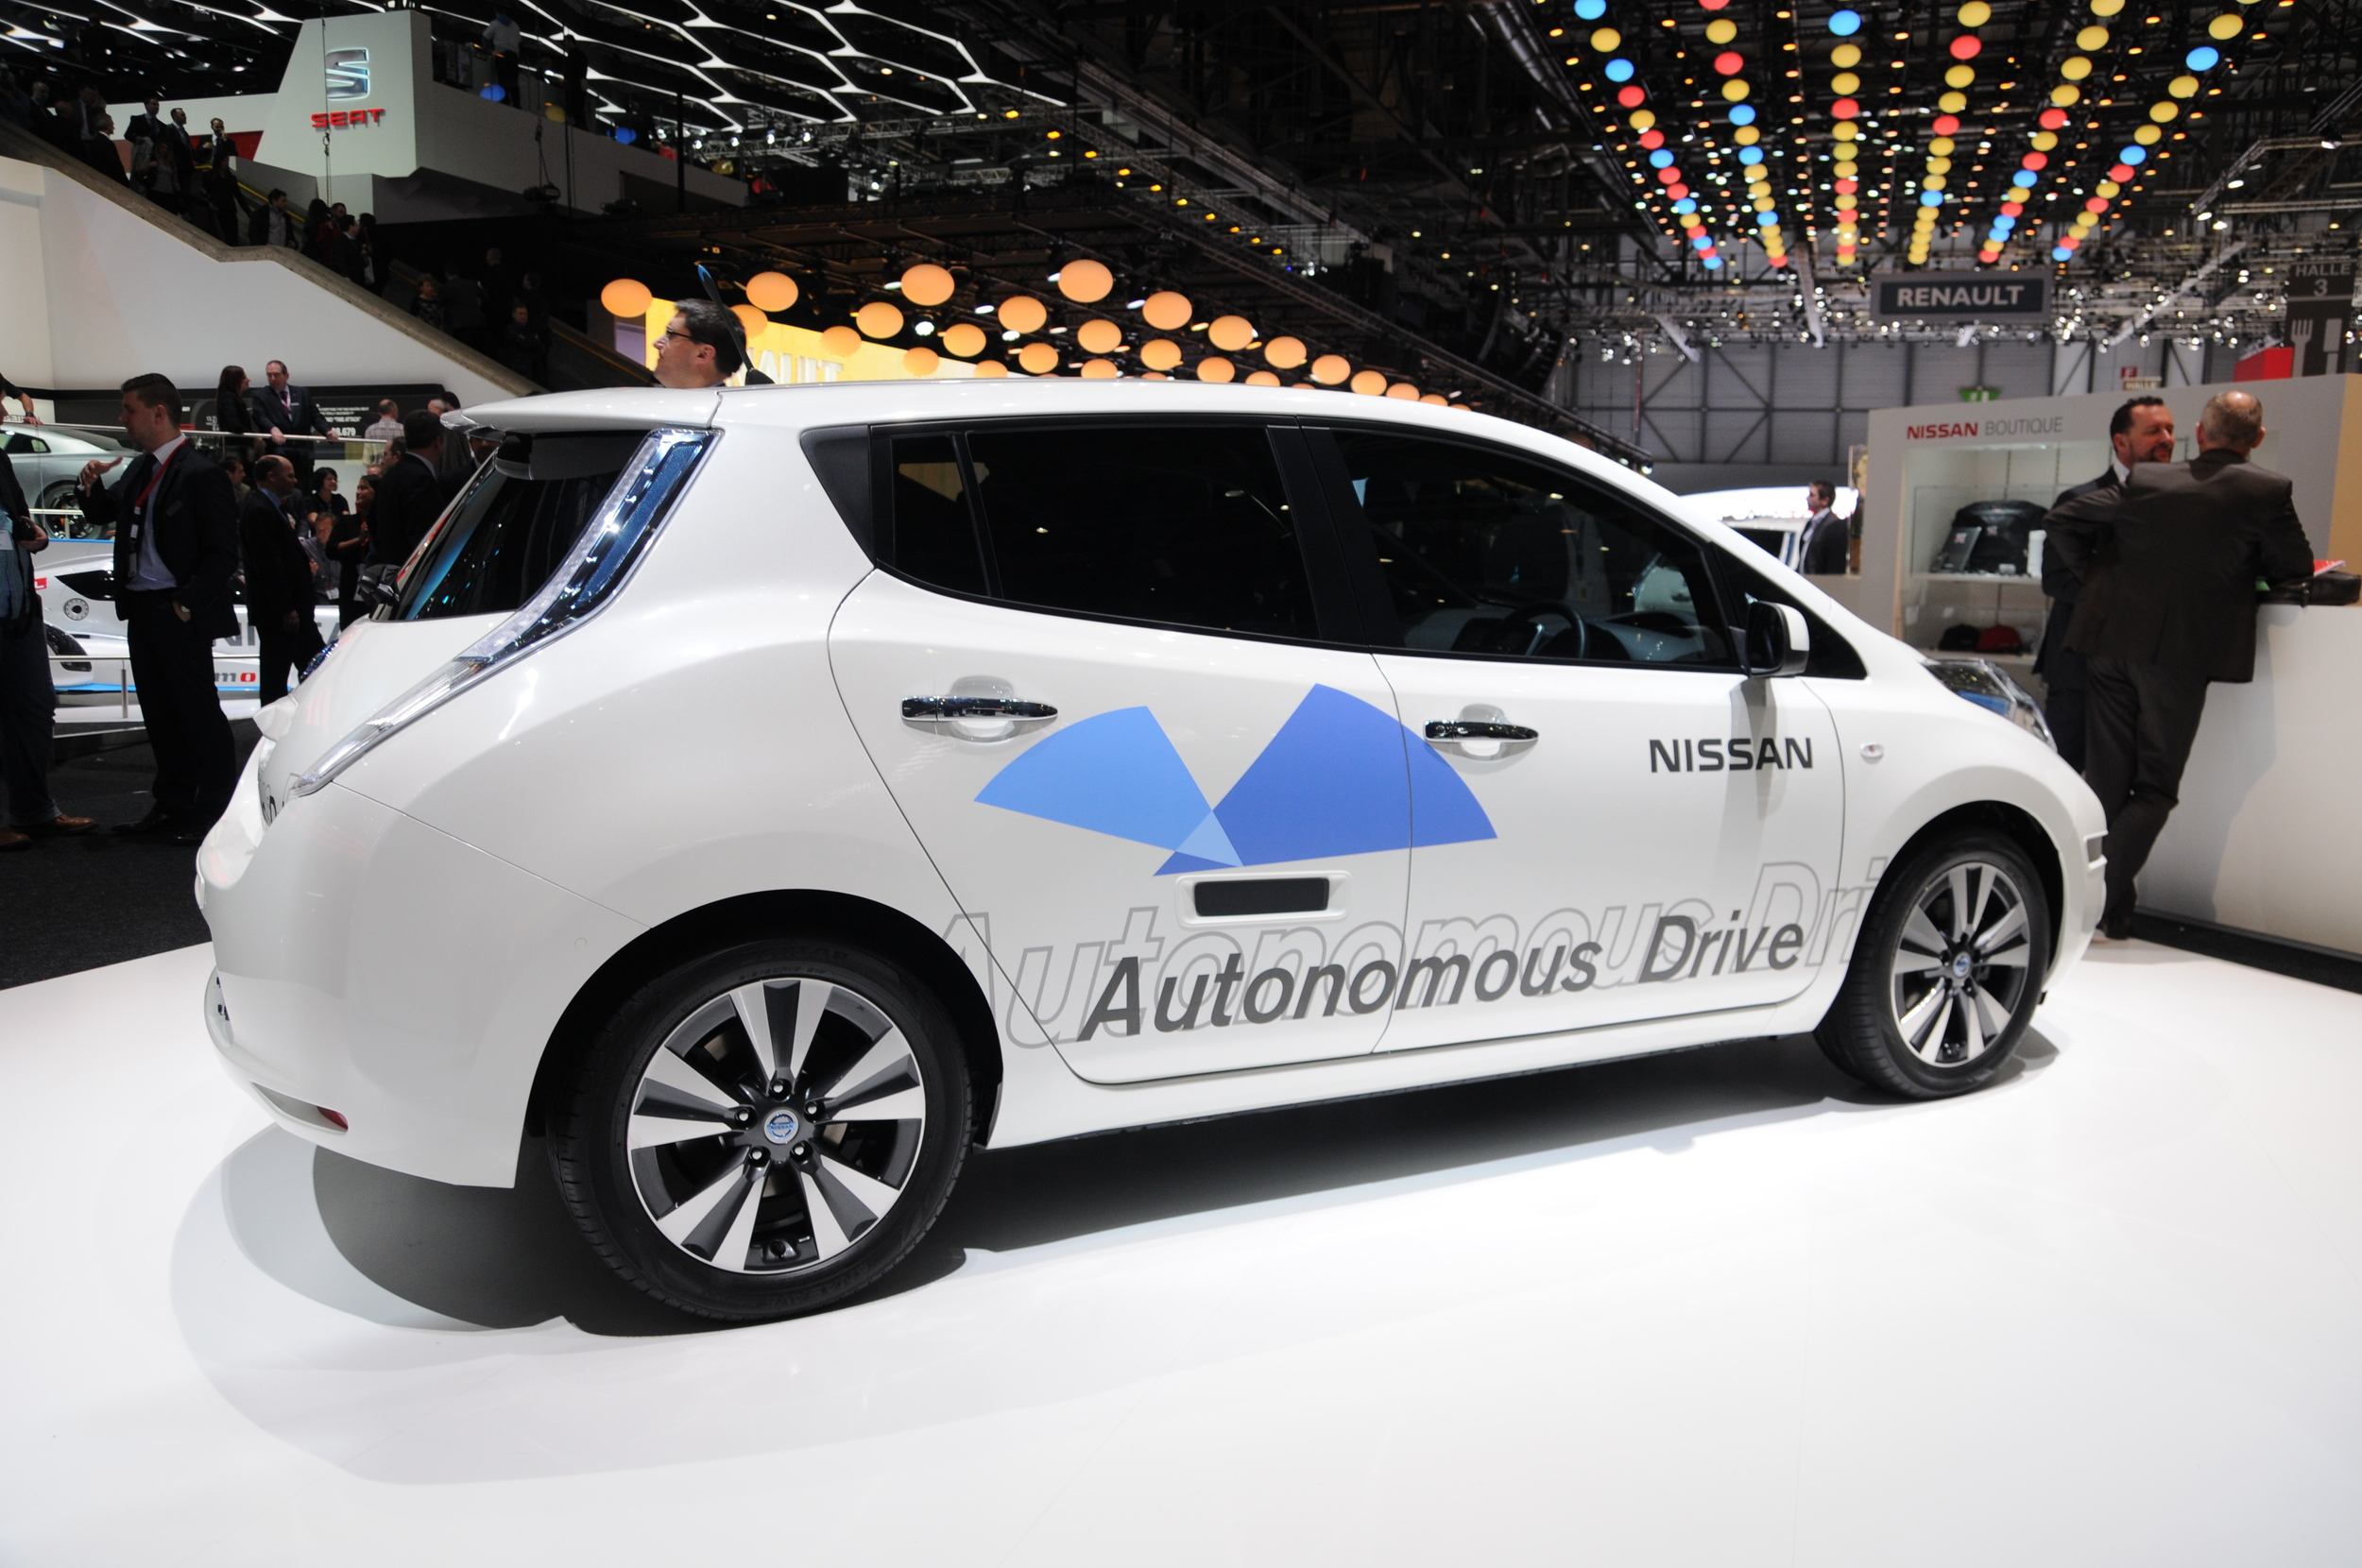 Autonomous Nissan Leaf Photo:  Wikipedia